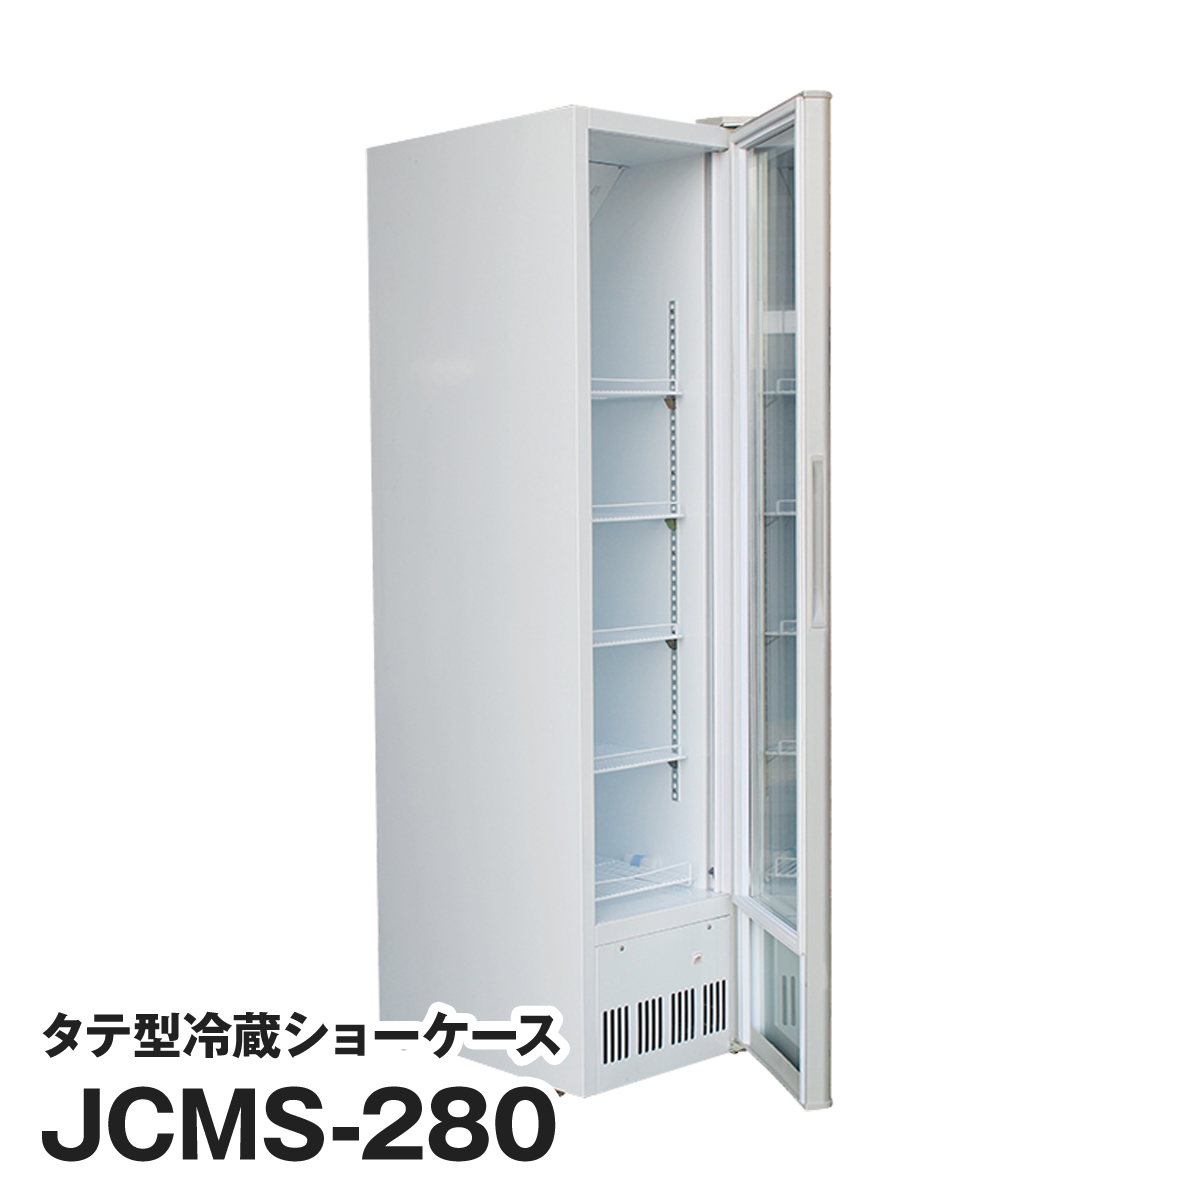 JCM社製 業務用 保冷庫 冷蔵庫 280L タテ型 冷蔵 ショーケース (両面扉) JCMS-280 新品